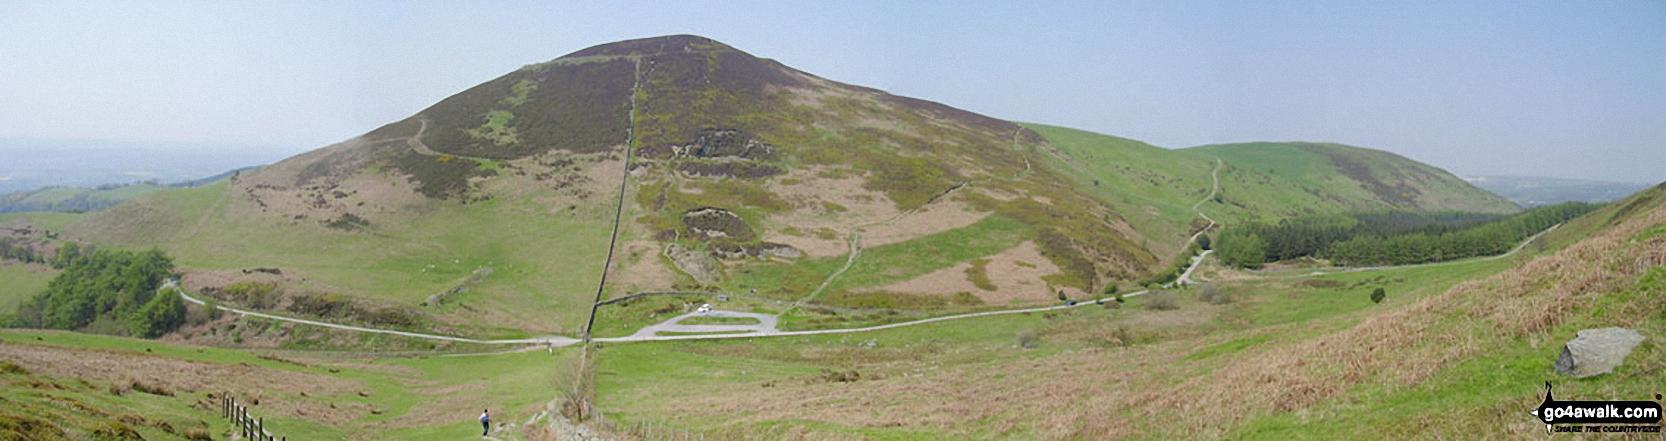 Walk fl155 Moel Famau and Cilcain - Moel Arthur from the summit of Moel Llys-y-coed<br> on The Offa's Dyke Path